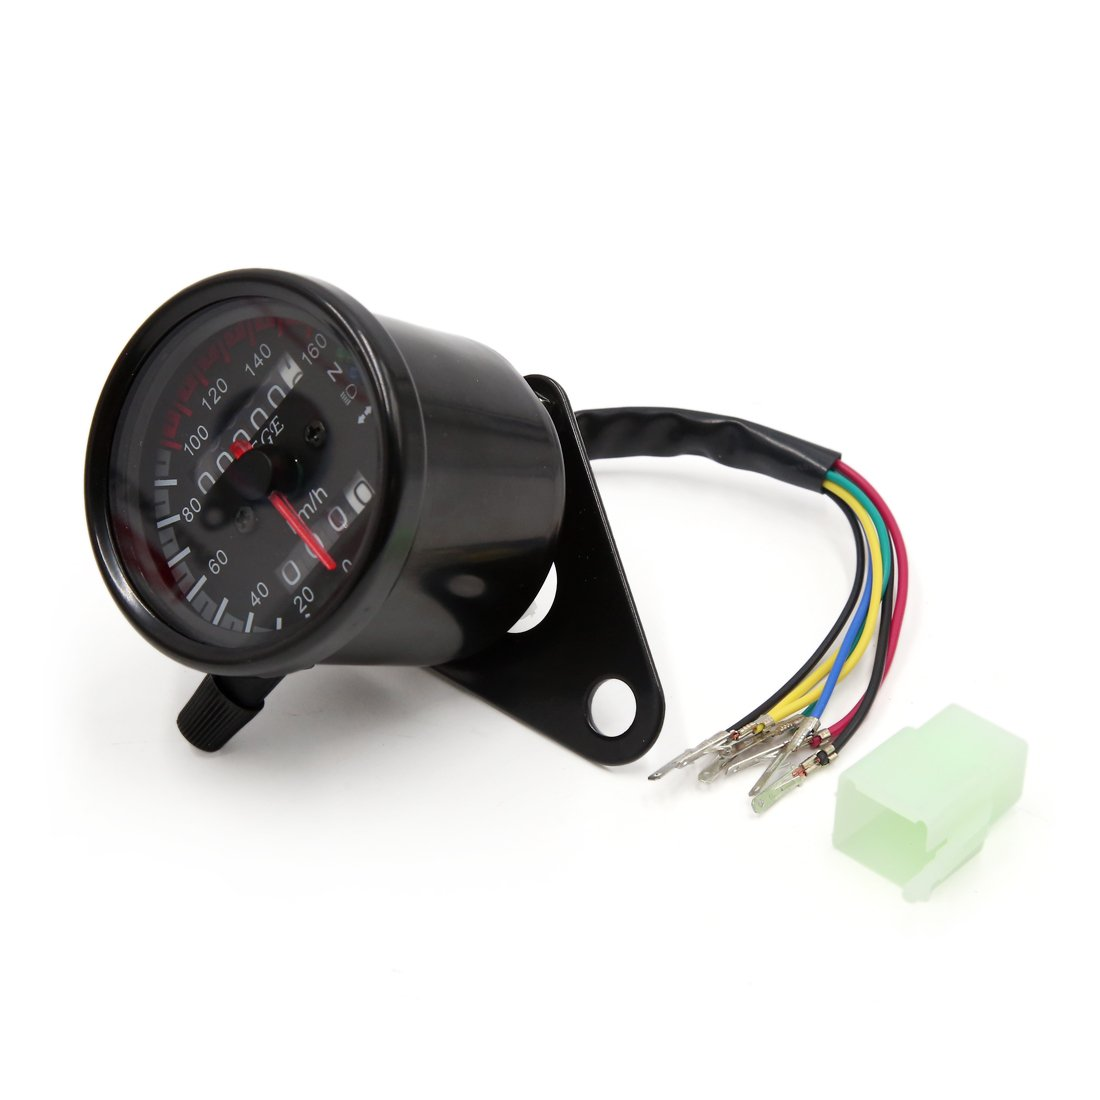 sourcingmap® Motocicleta universal 0-160Km / h Instrumento Medidor Negro dual del odómetro del velocímetro a17031000ux2061